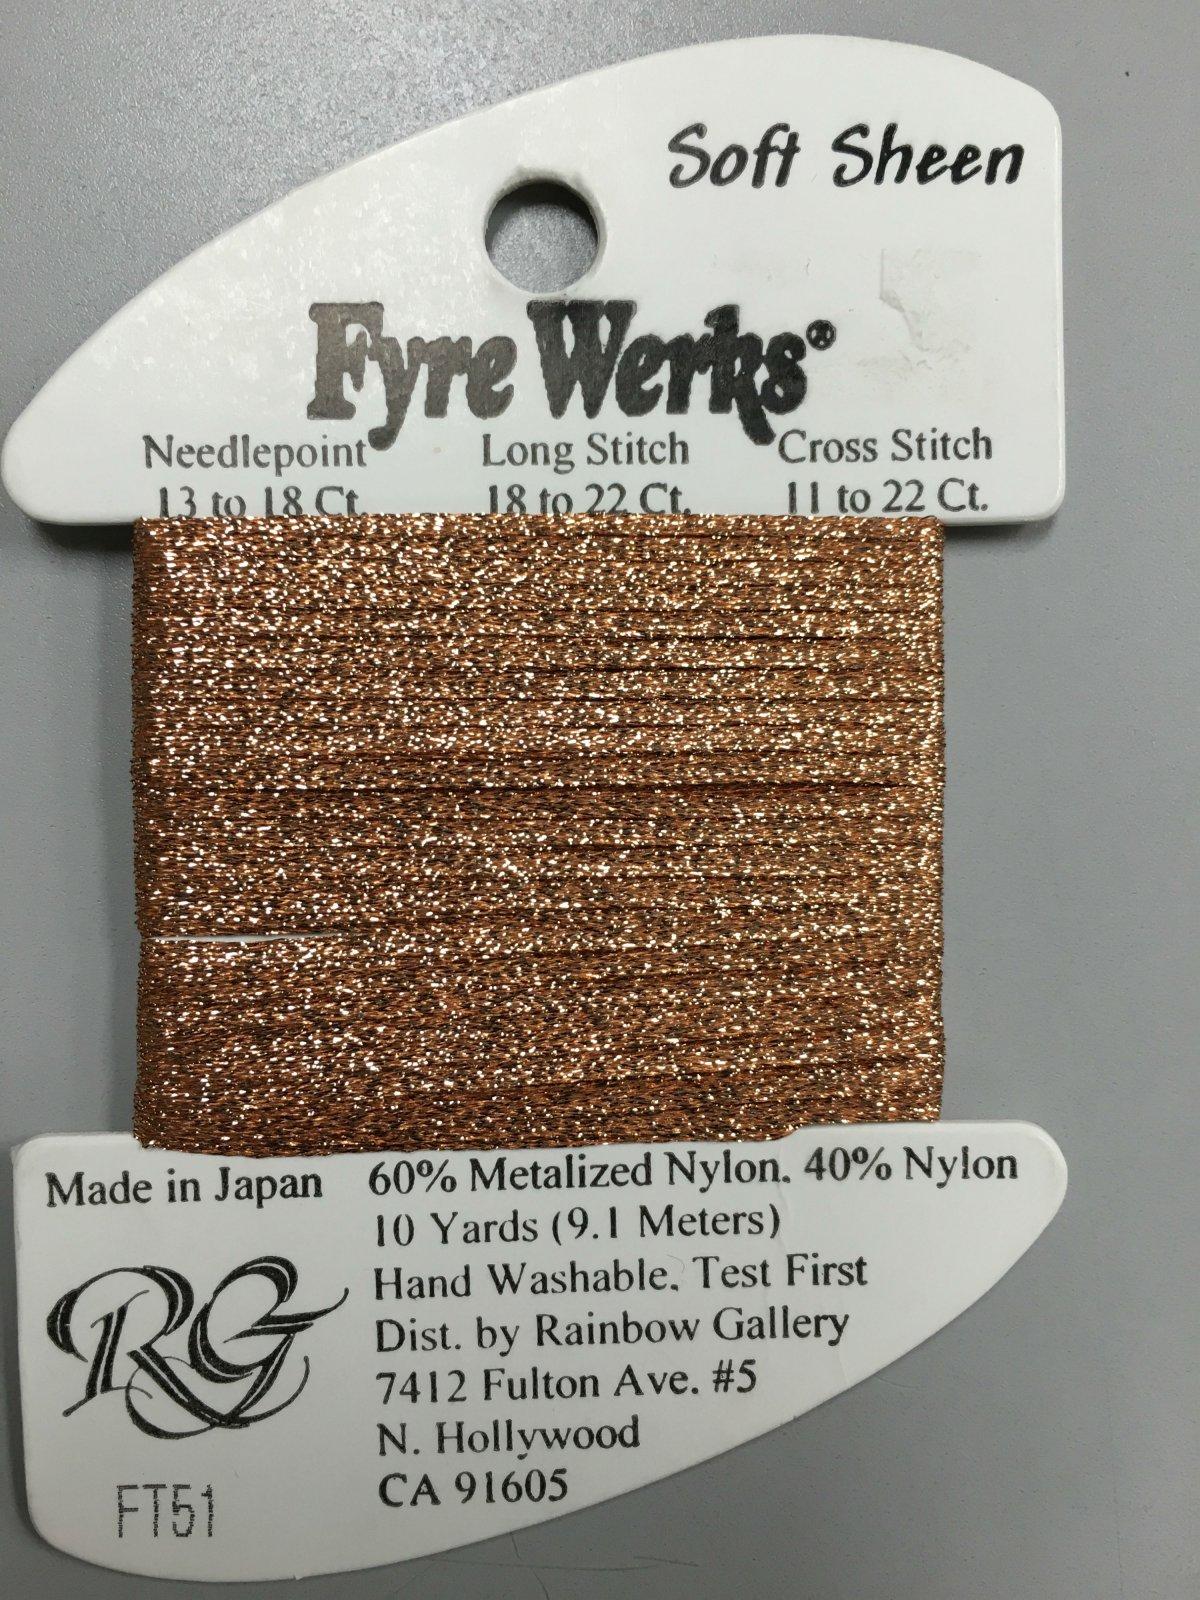 Fyre Werks Soft Sheen FT51